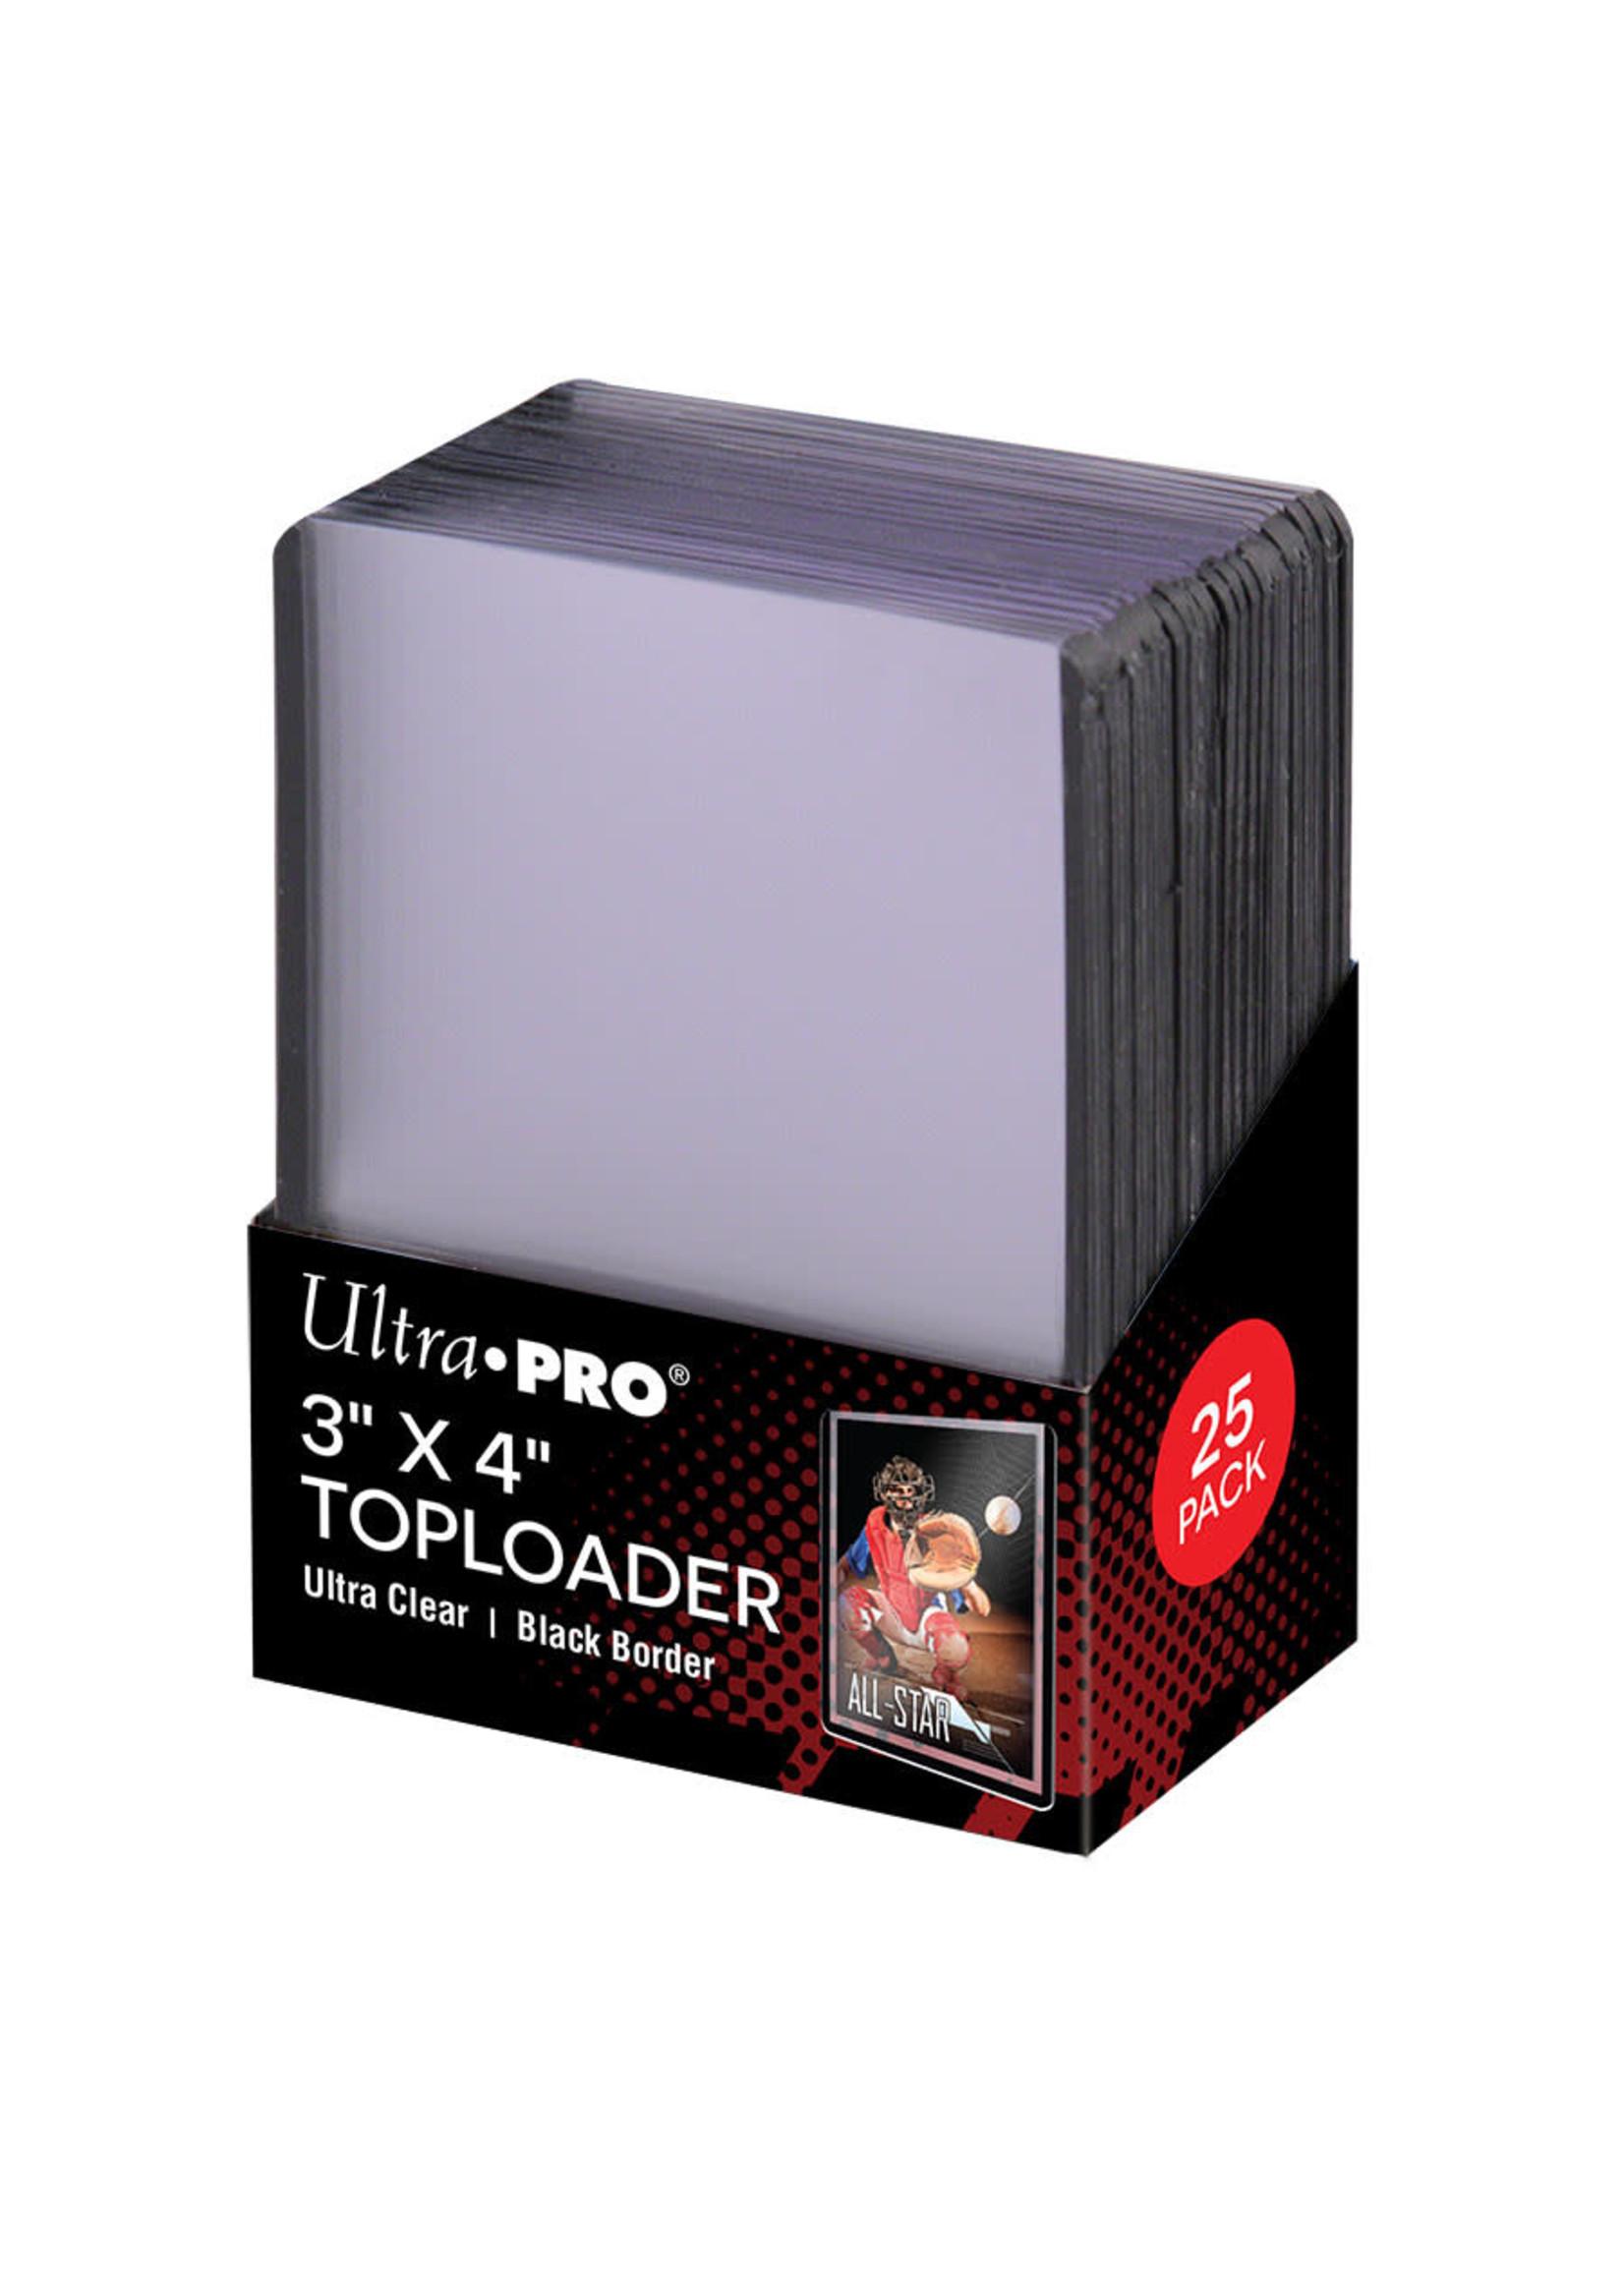 Ultra Pro Toploader 3X4 Black Border